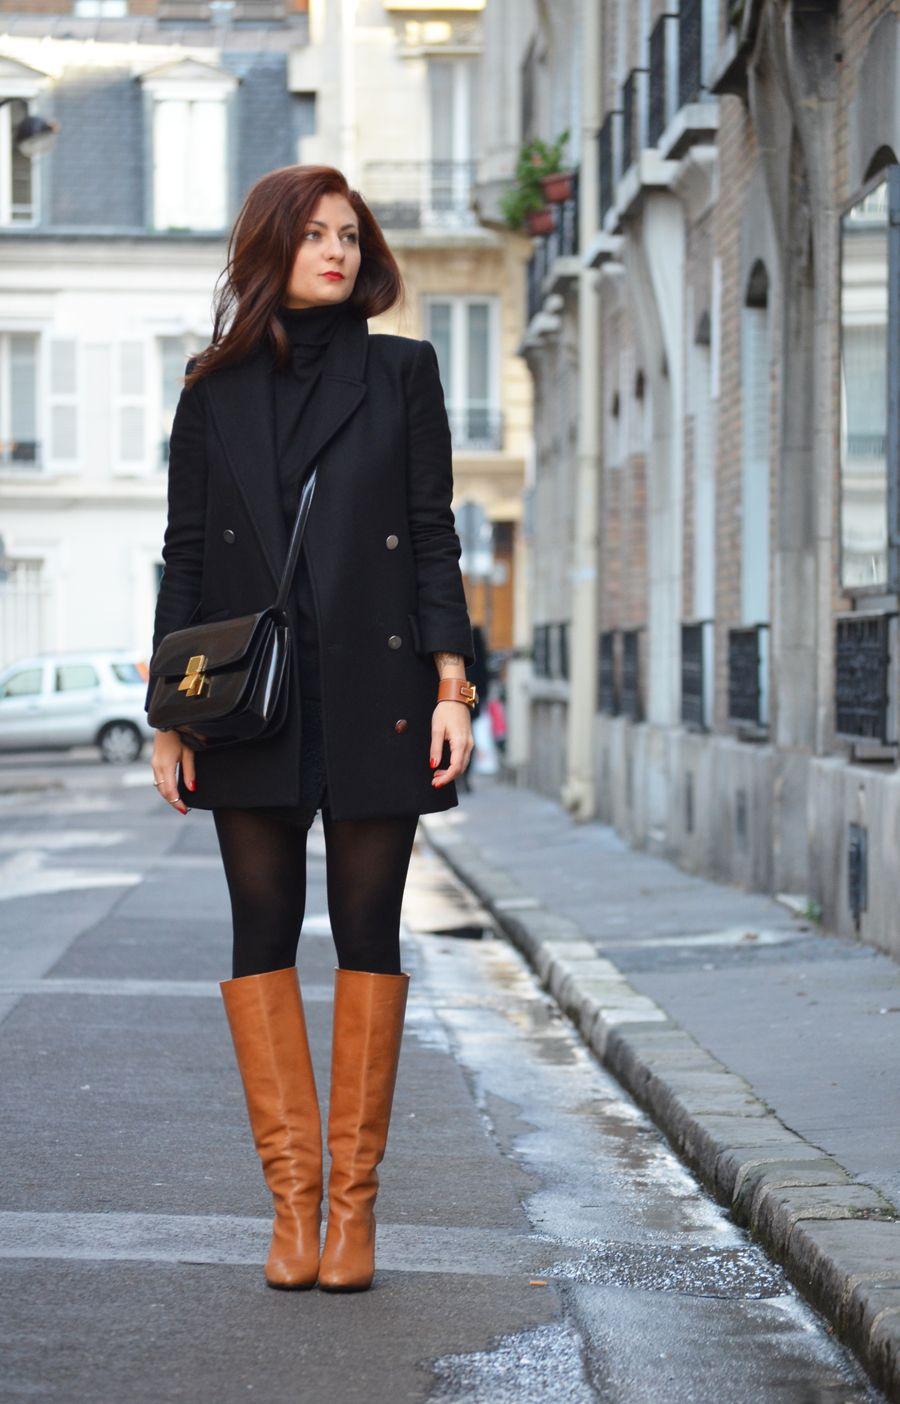 WASTED HOURS Manteau Mango \u2013 pull Gap \u2013 jupe Zara \u2013 bottes Tara Jarmon \u2013  bracelet Hermès \u2013 sac Céline